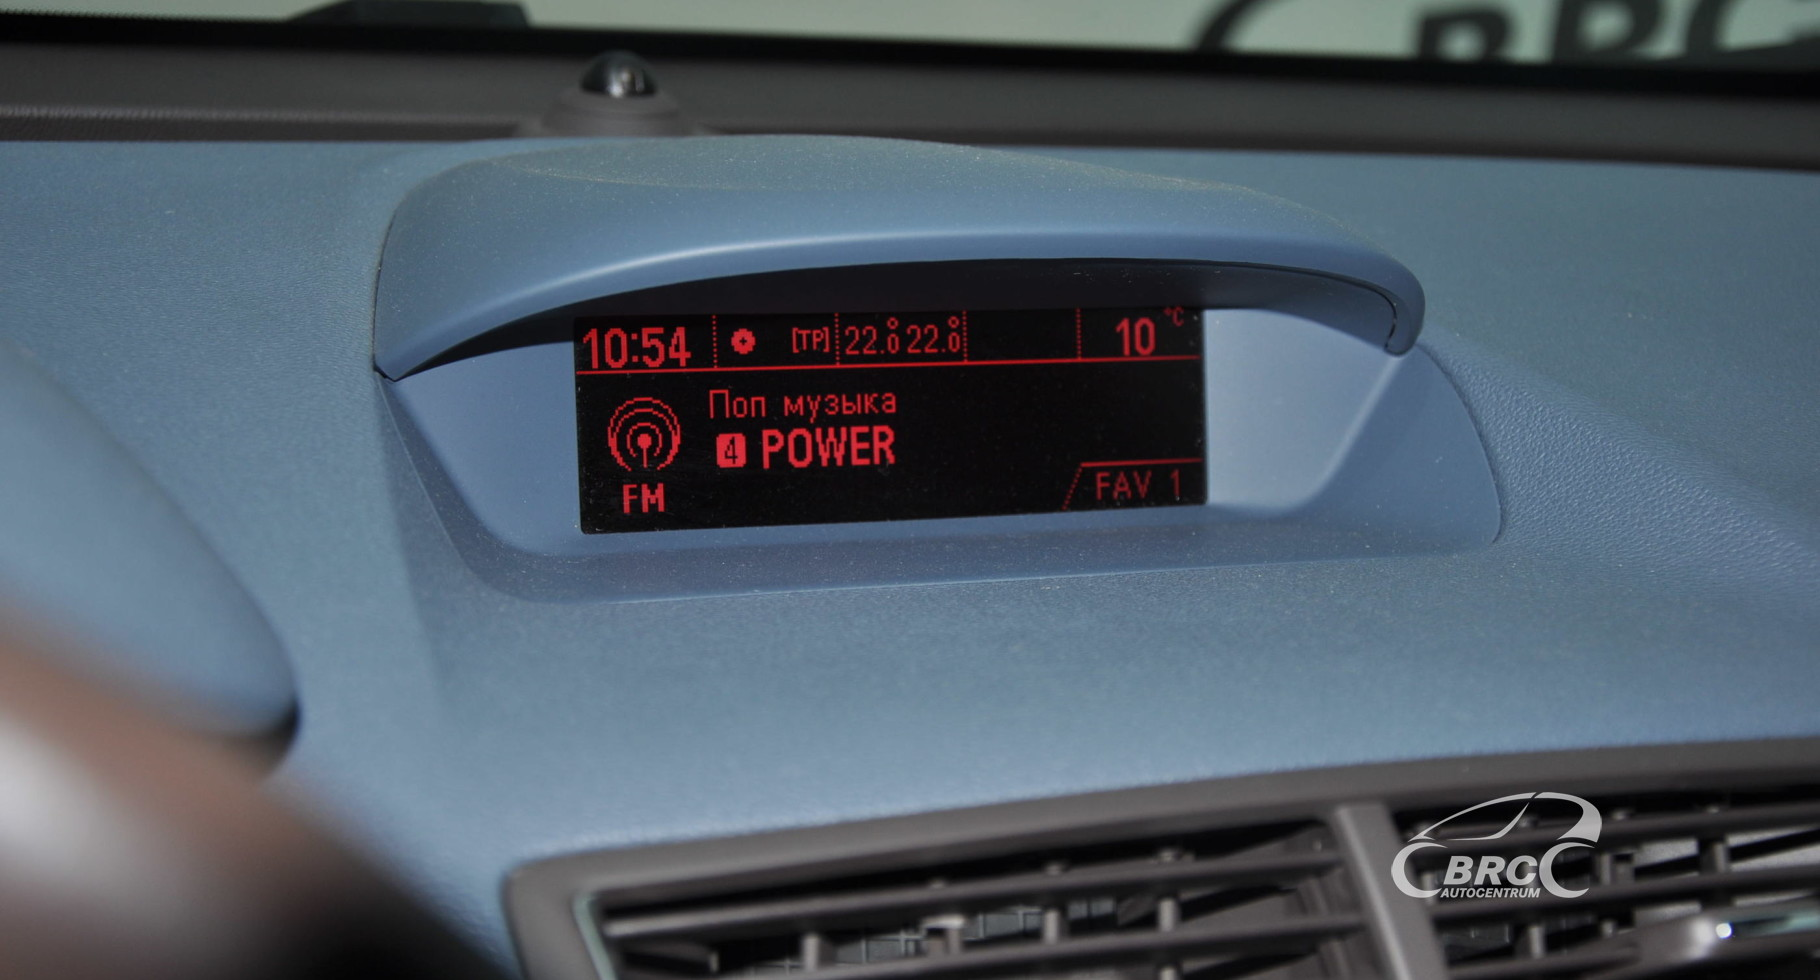 Opel Mokka 1.4 EcoTec Turbo 4x4 Automatas